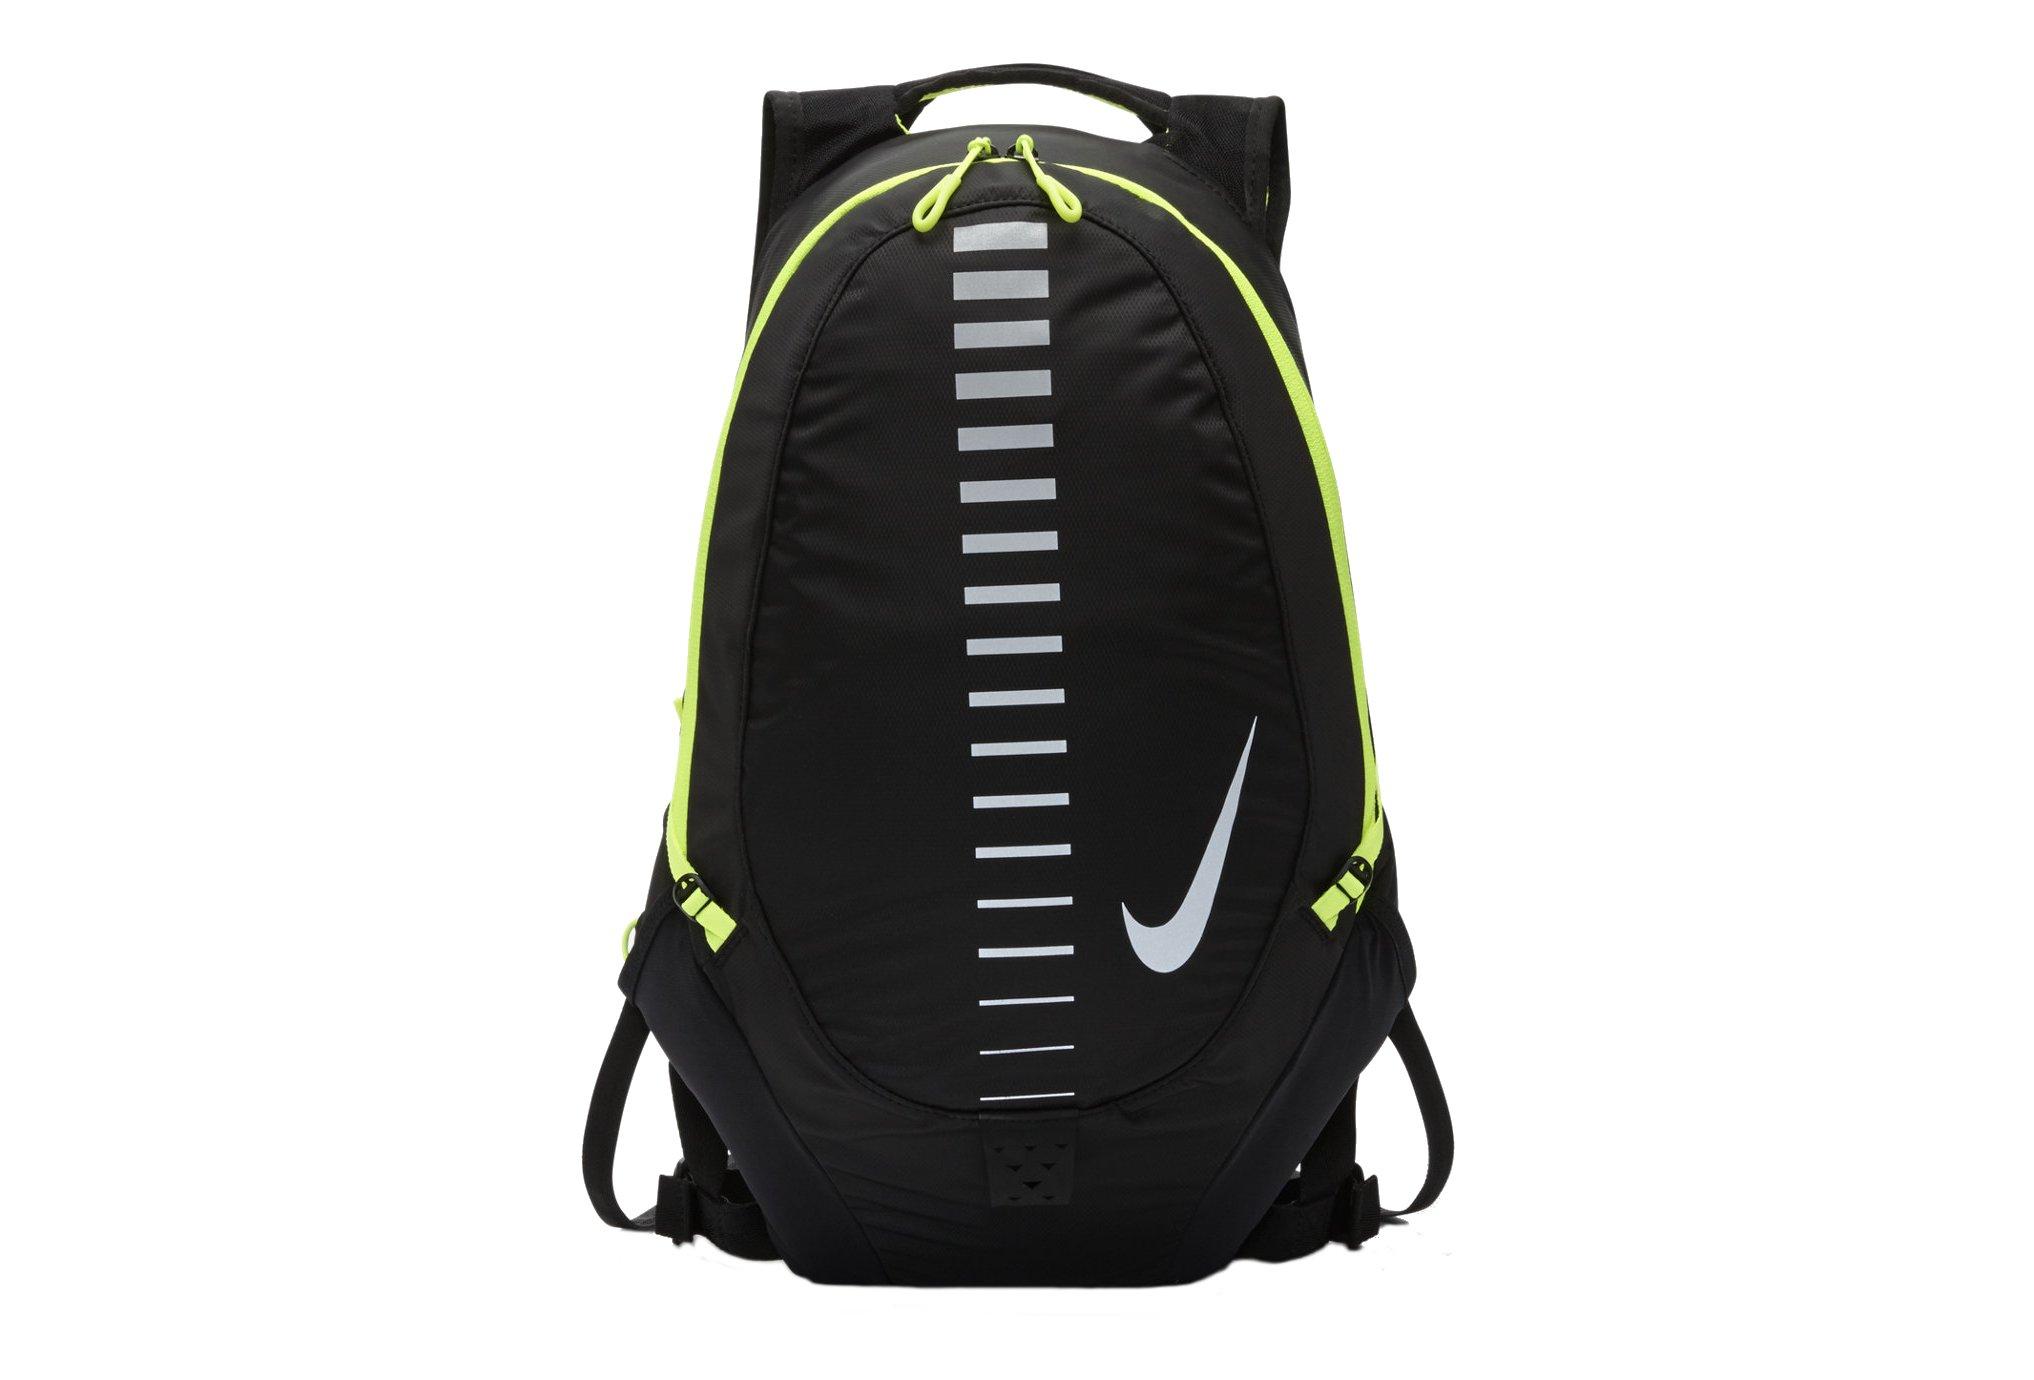 Nike Commuter Sac à dos